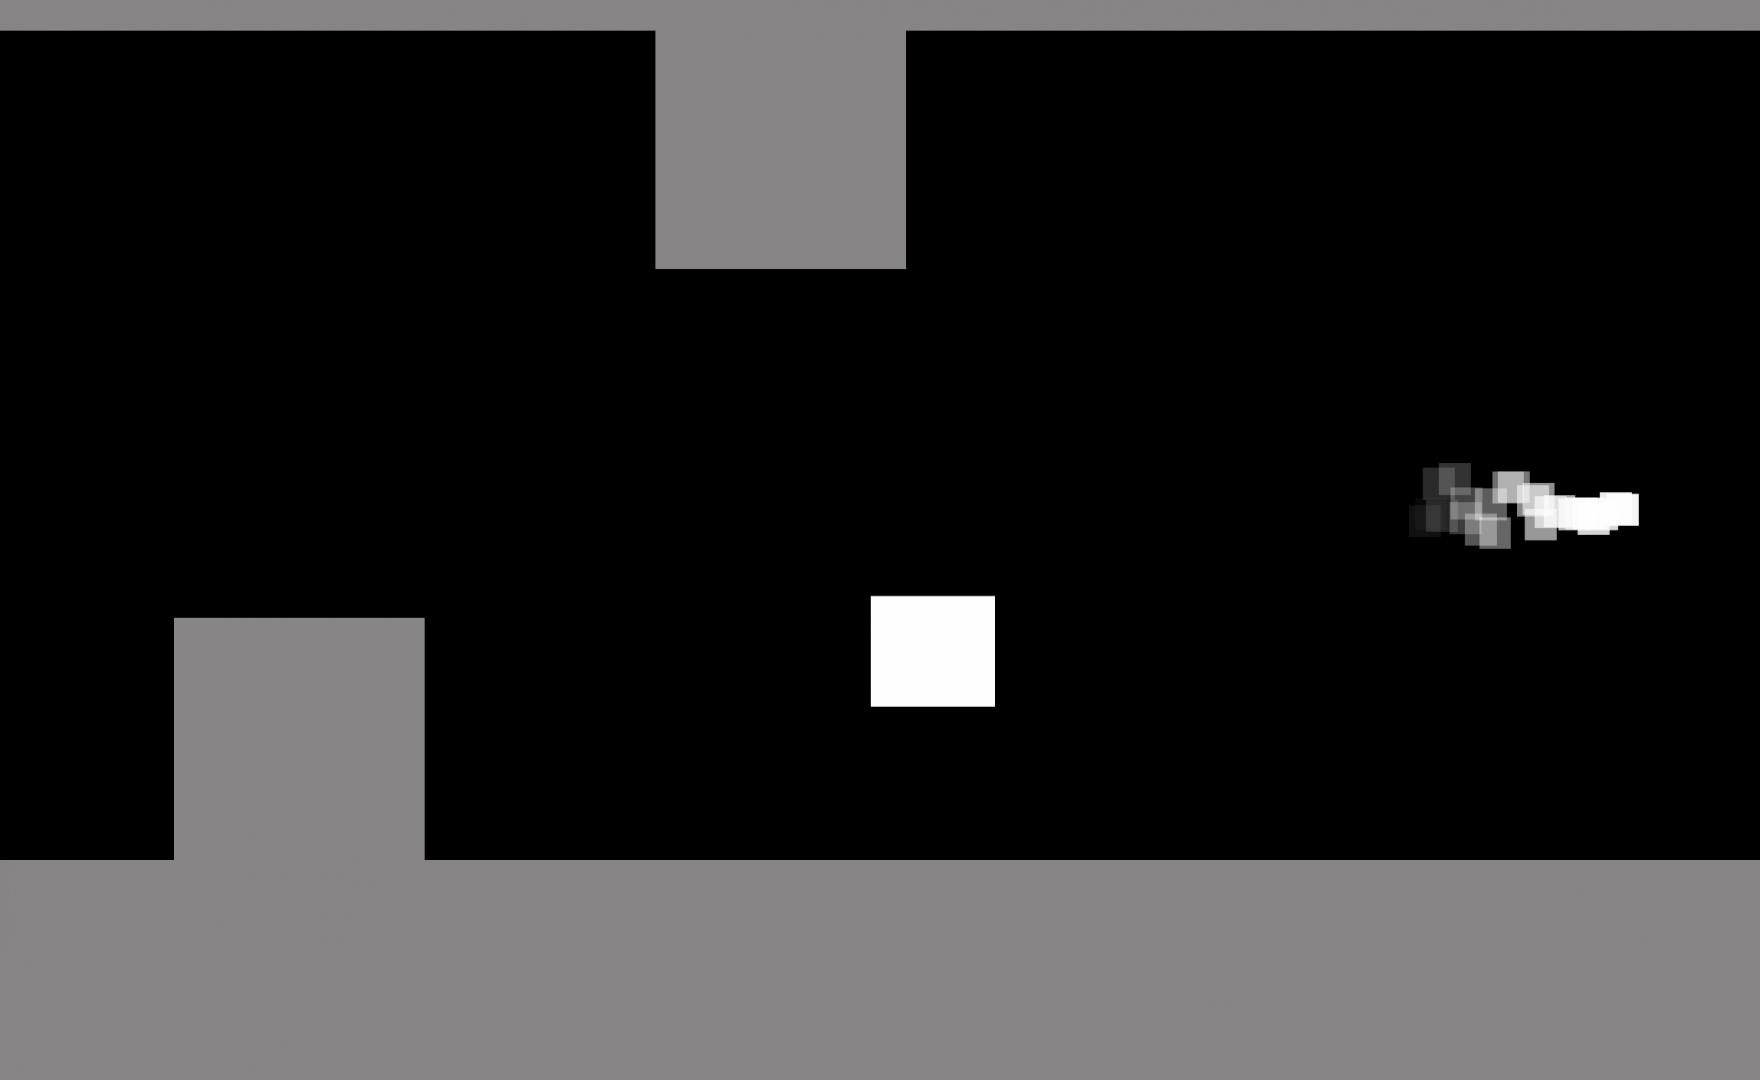 Screenshot 4 of Endless Runner playable.